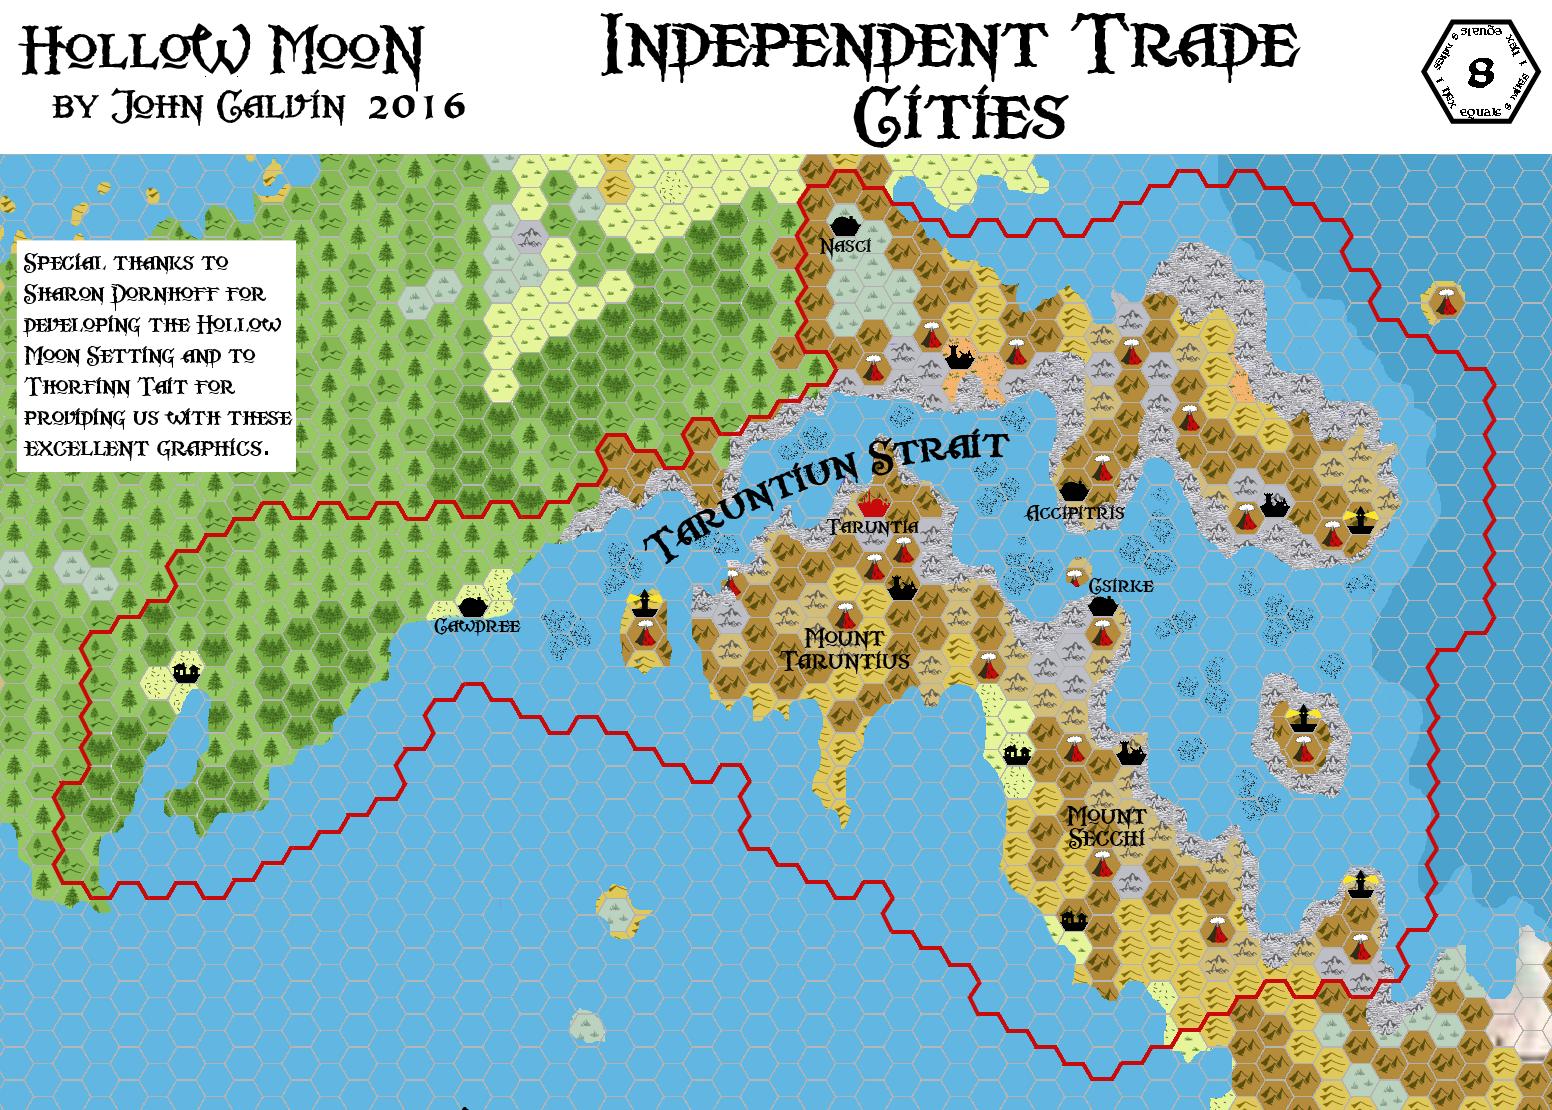 Independent Trade Cities, 8 miles per hex